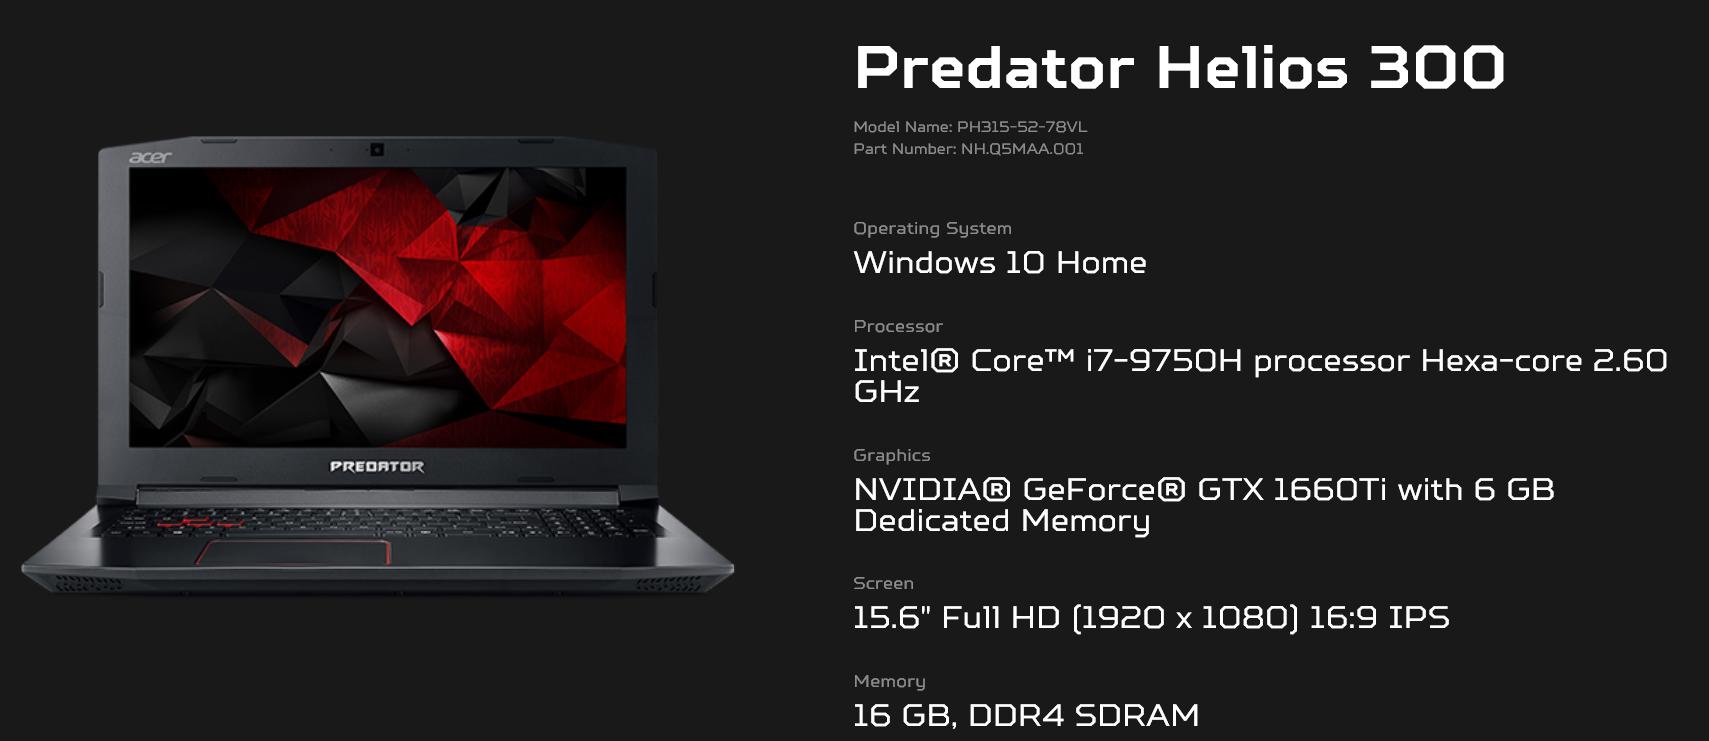 Laptop version of GeForce GTX 1660 Ti confirmed thanks to